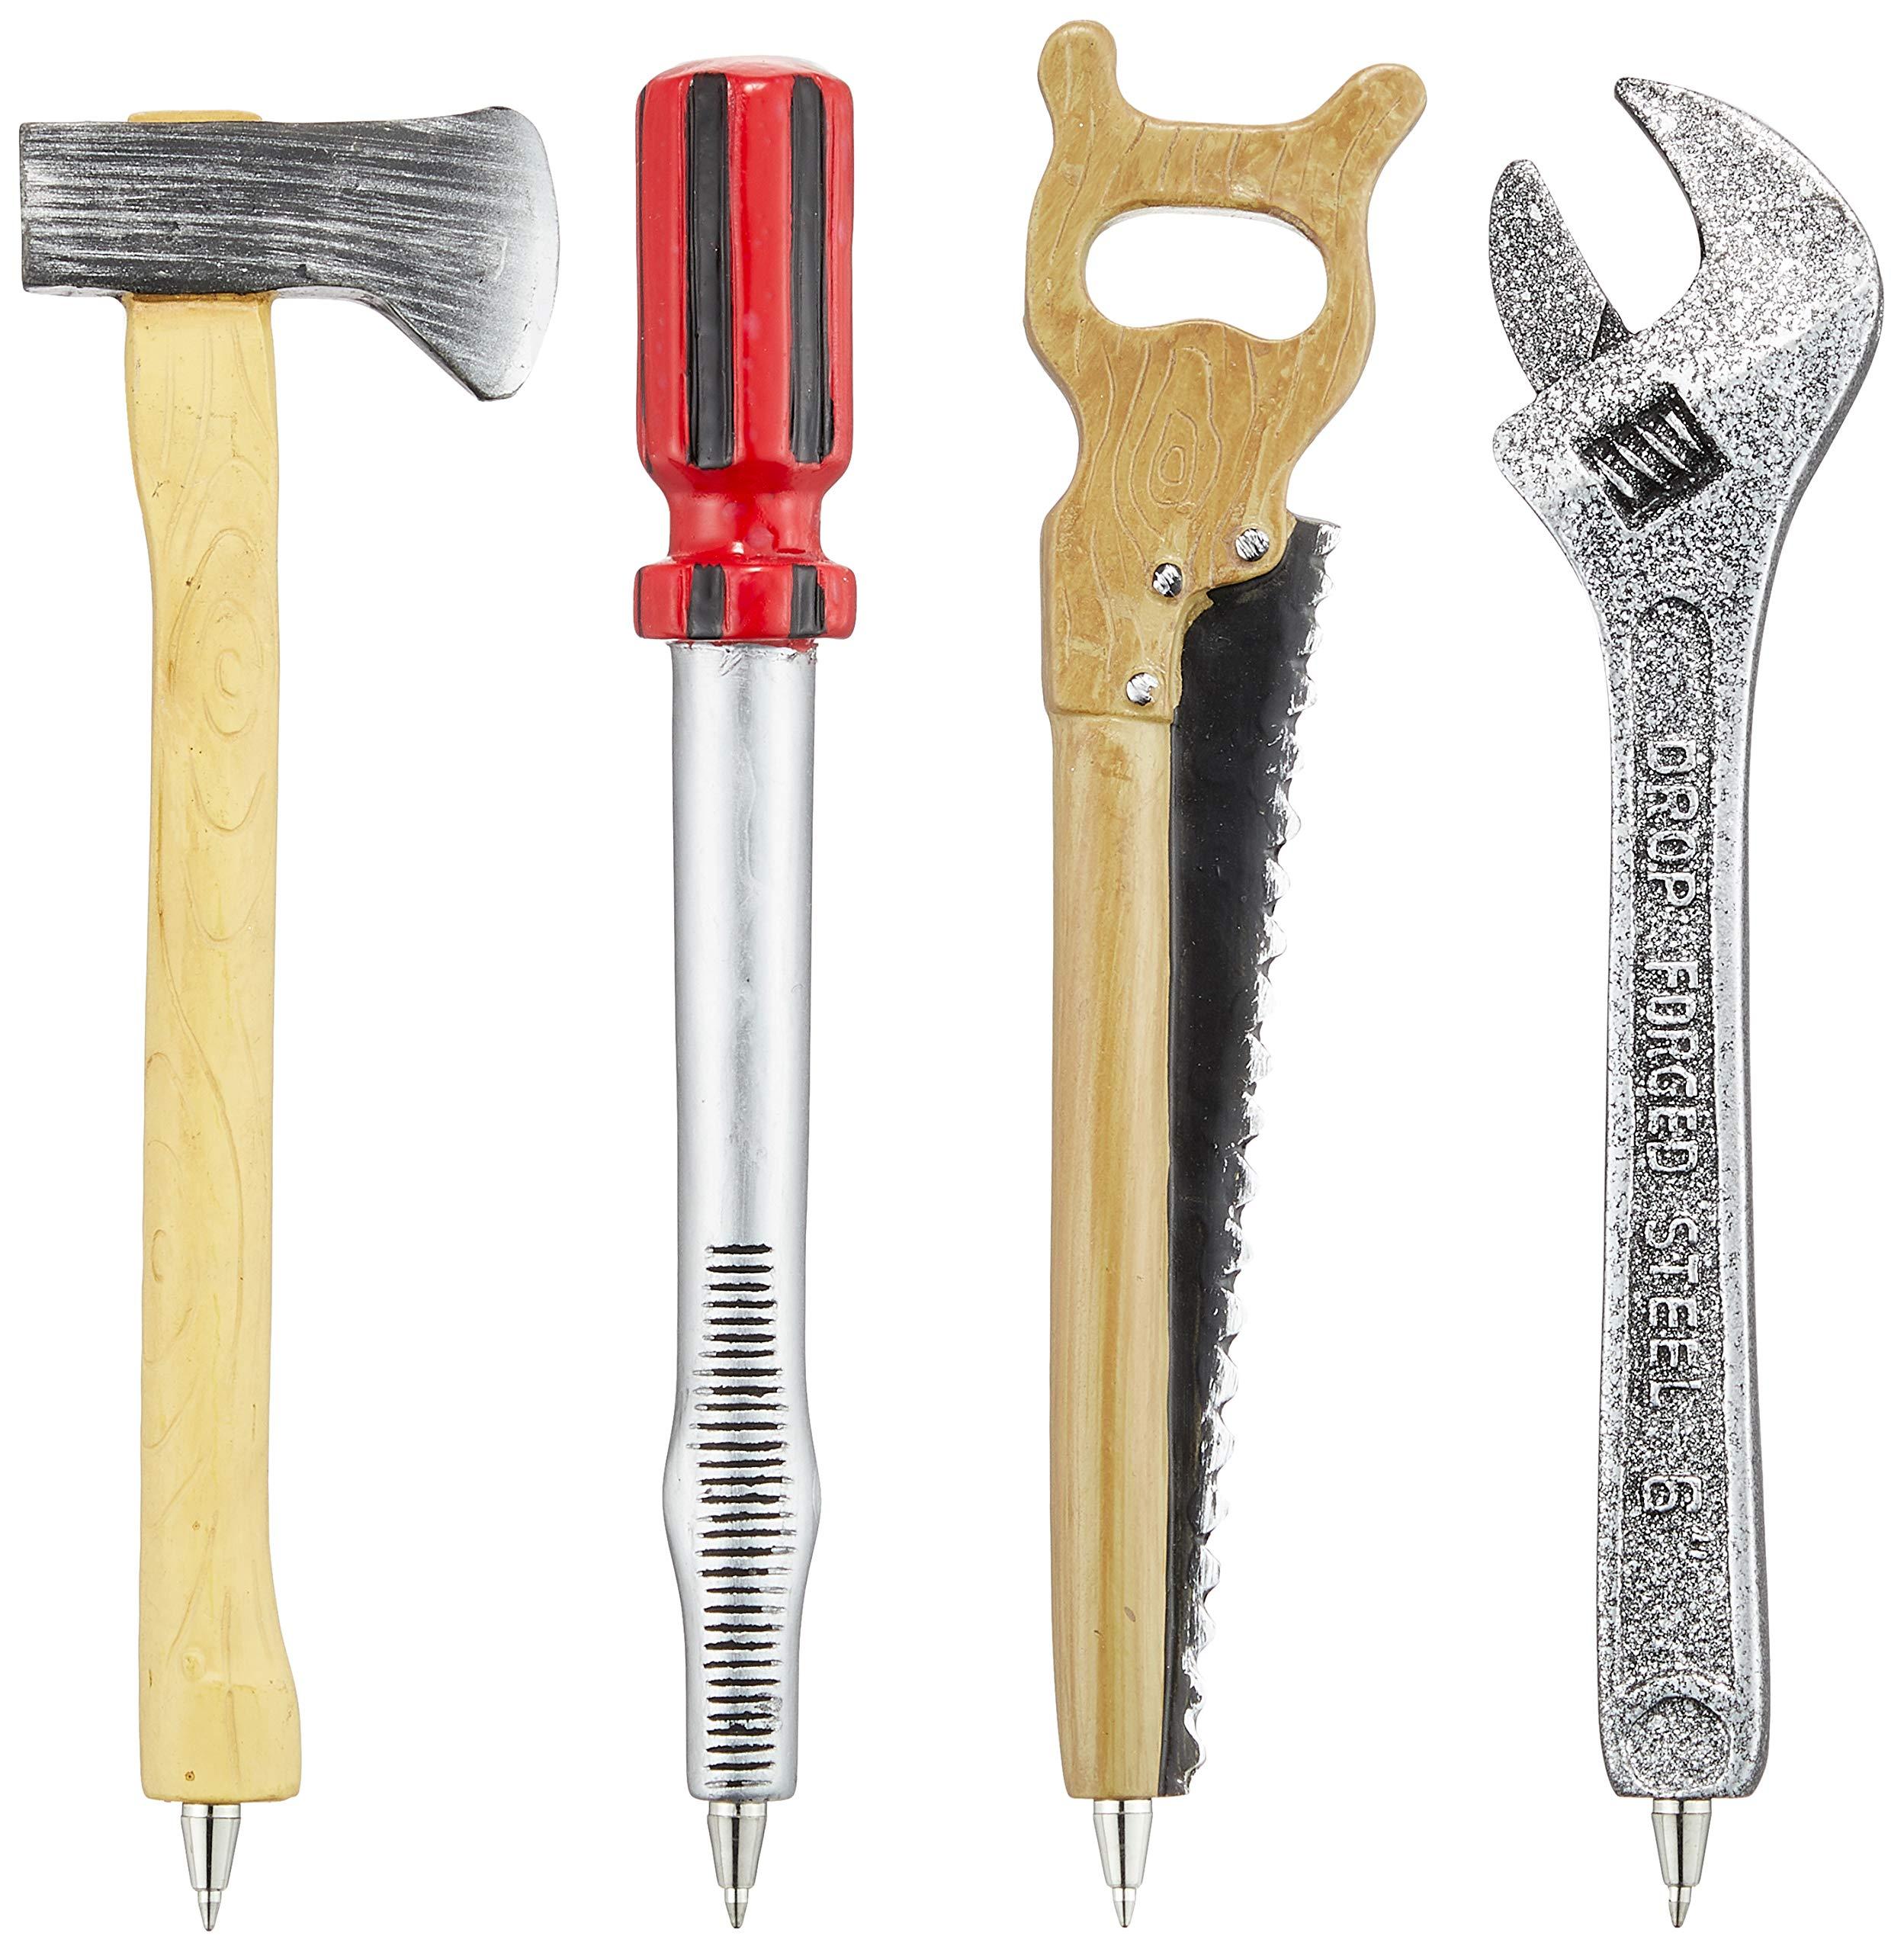 【LE STUDIO】 Tool Pen Box Carpentry Tool Type Pen 12 Set by Le Studio